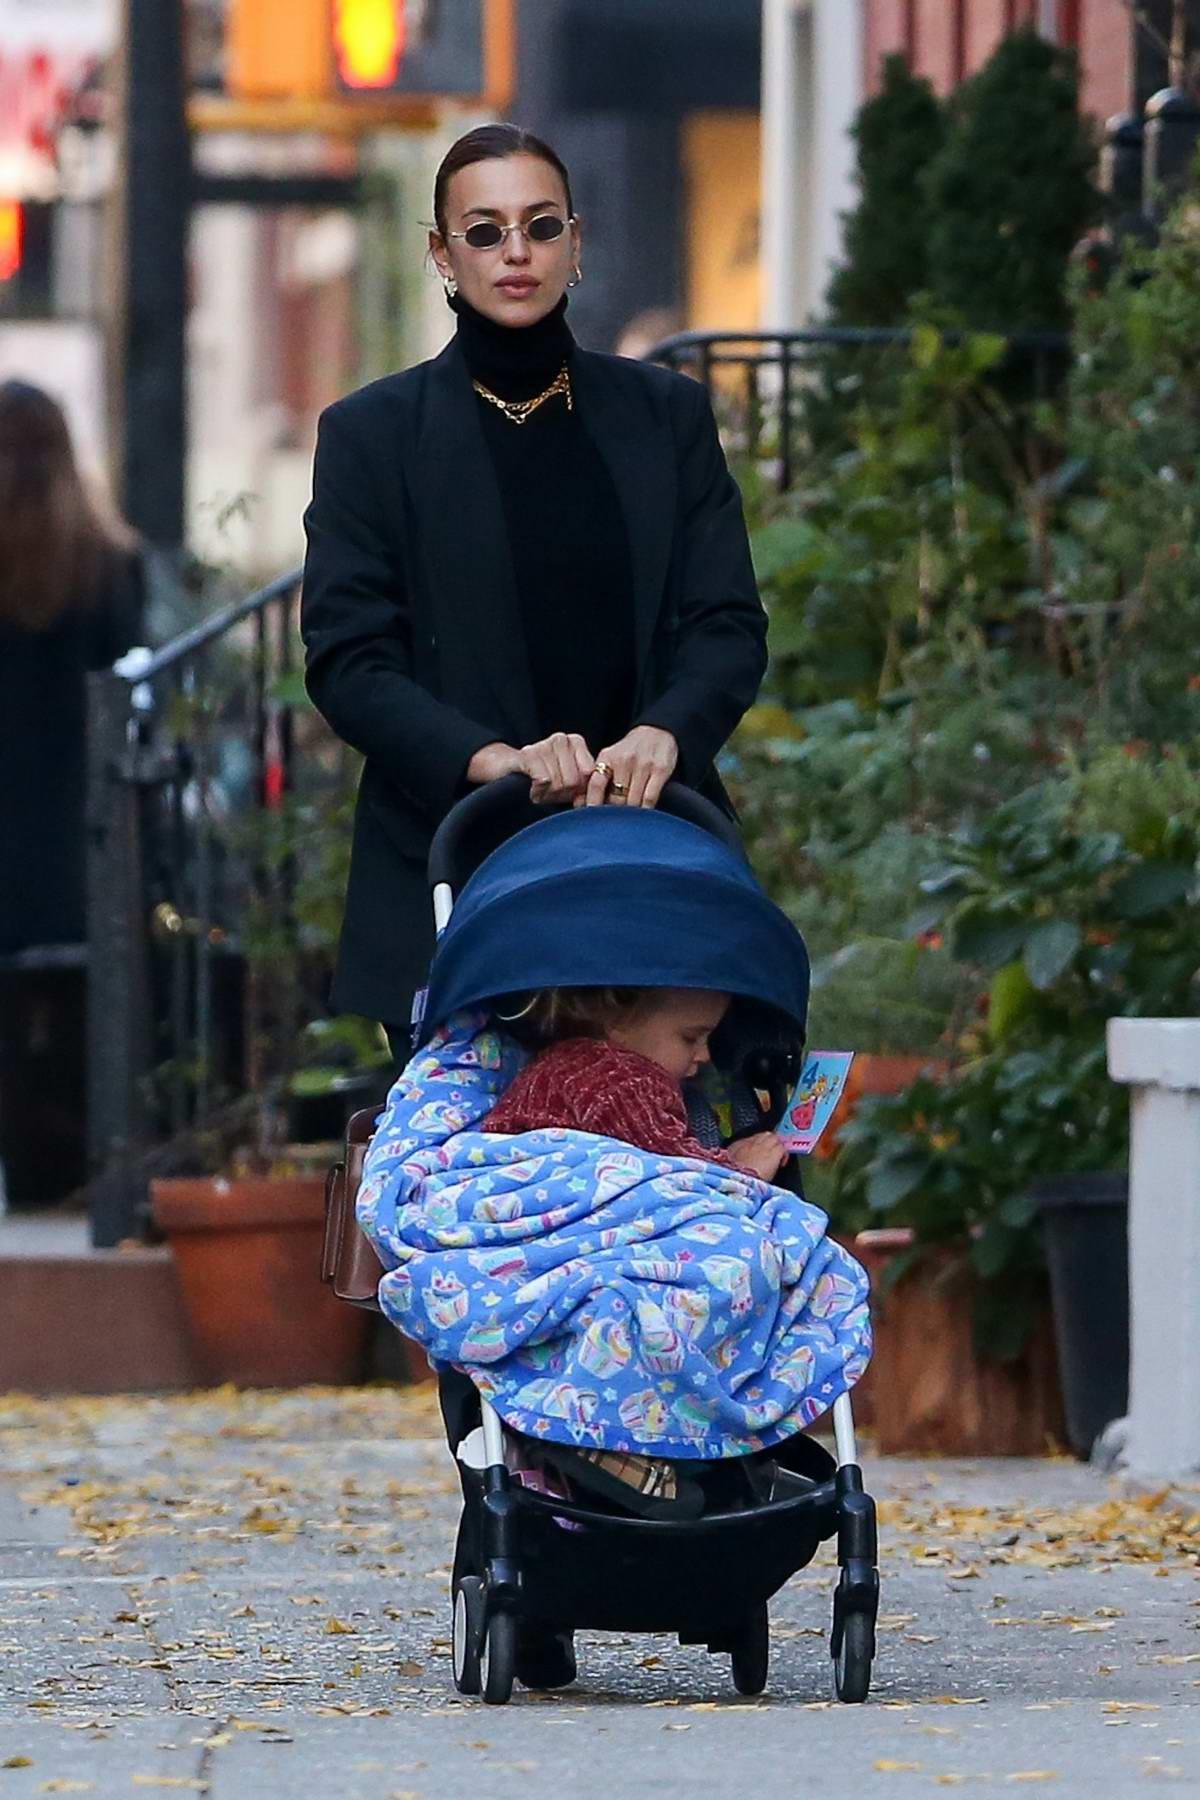 Irina Shayk looks sleek in all-black while enjoying a walk with her daughter in New York City